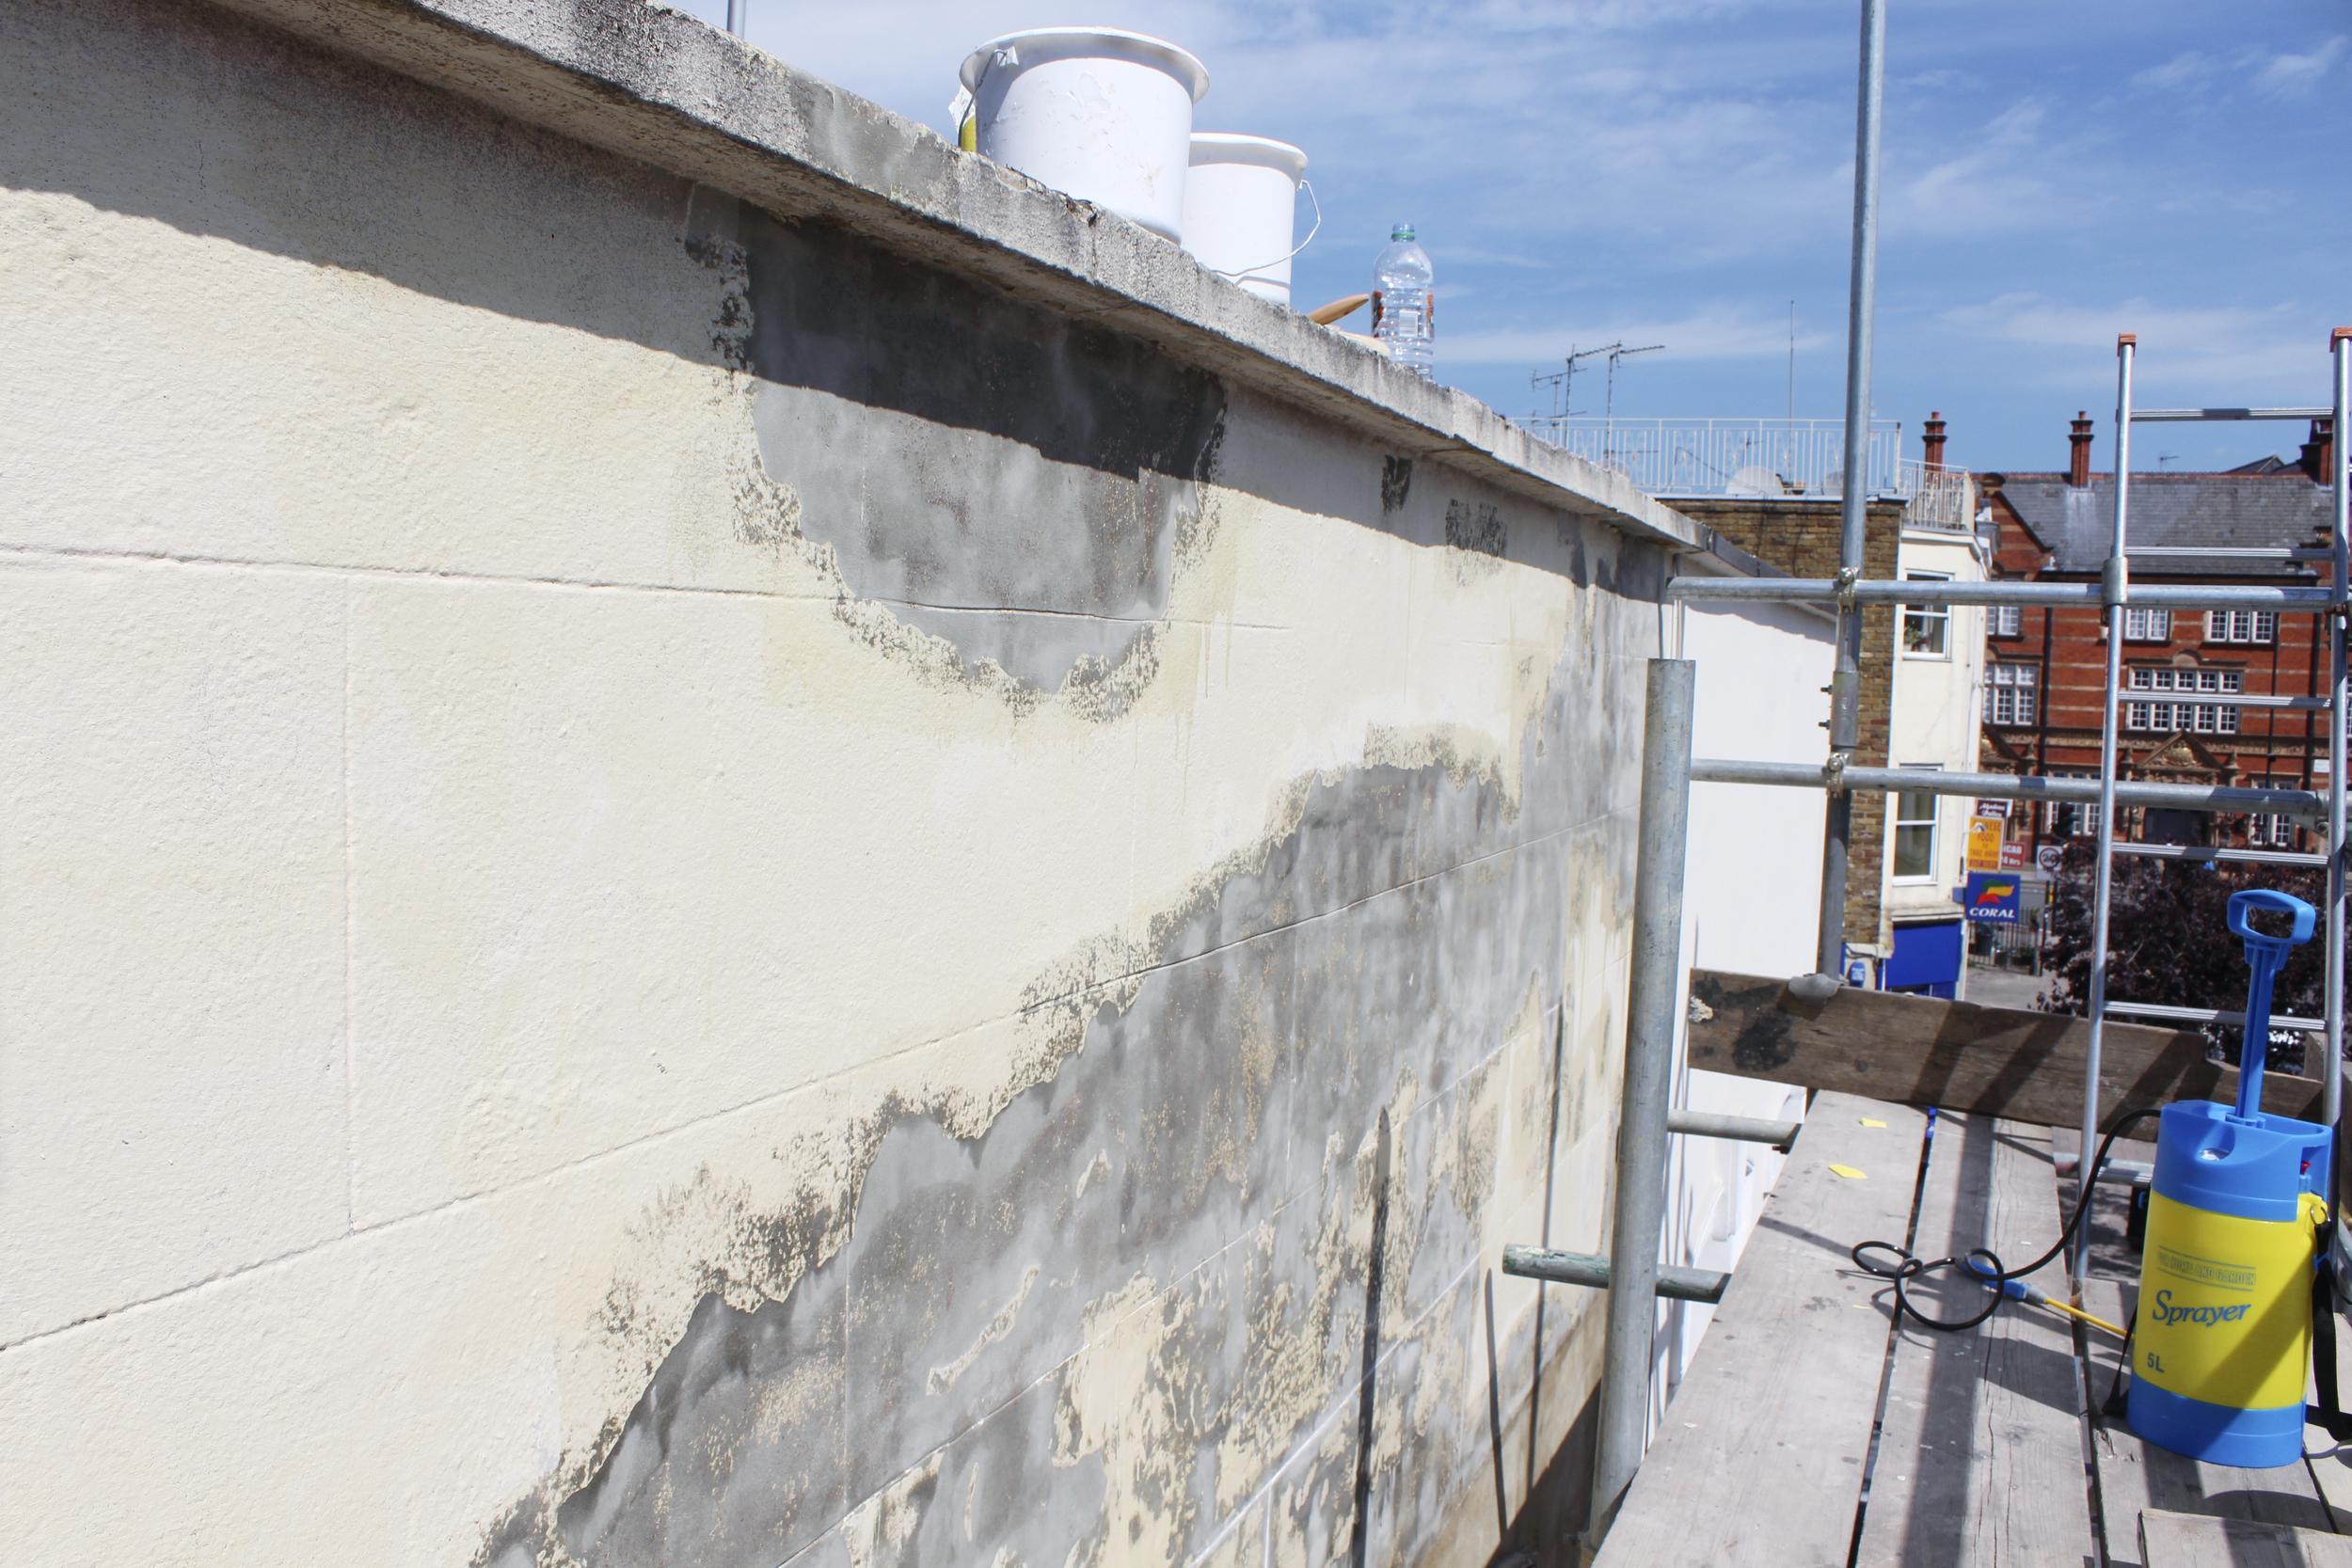 #NHRenovations #Painter #Decorator #London #Kentishtown #Kentish #Listedbuilding #Masonry #Limerender #Keim #Keimminerals #Exterior #Building